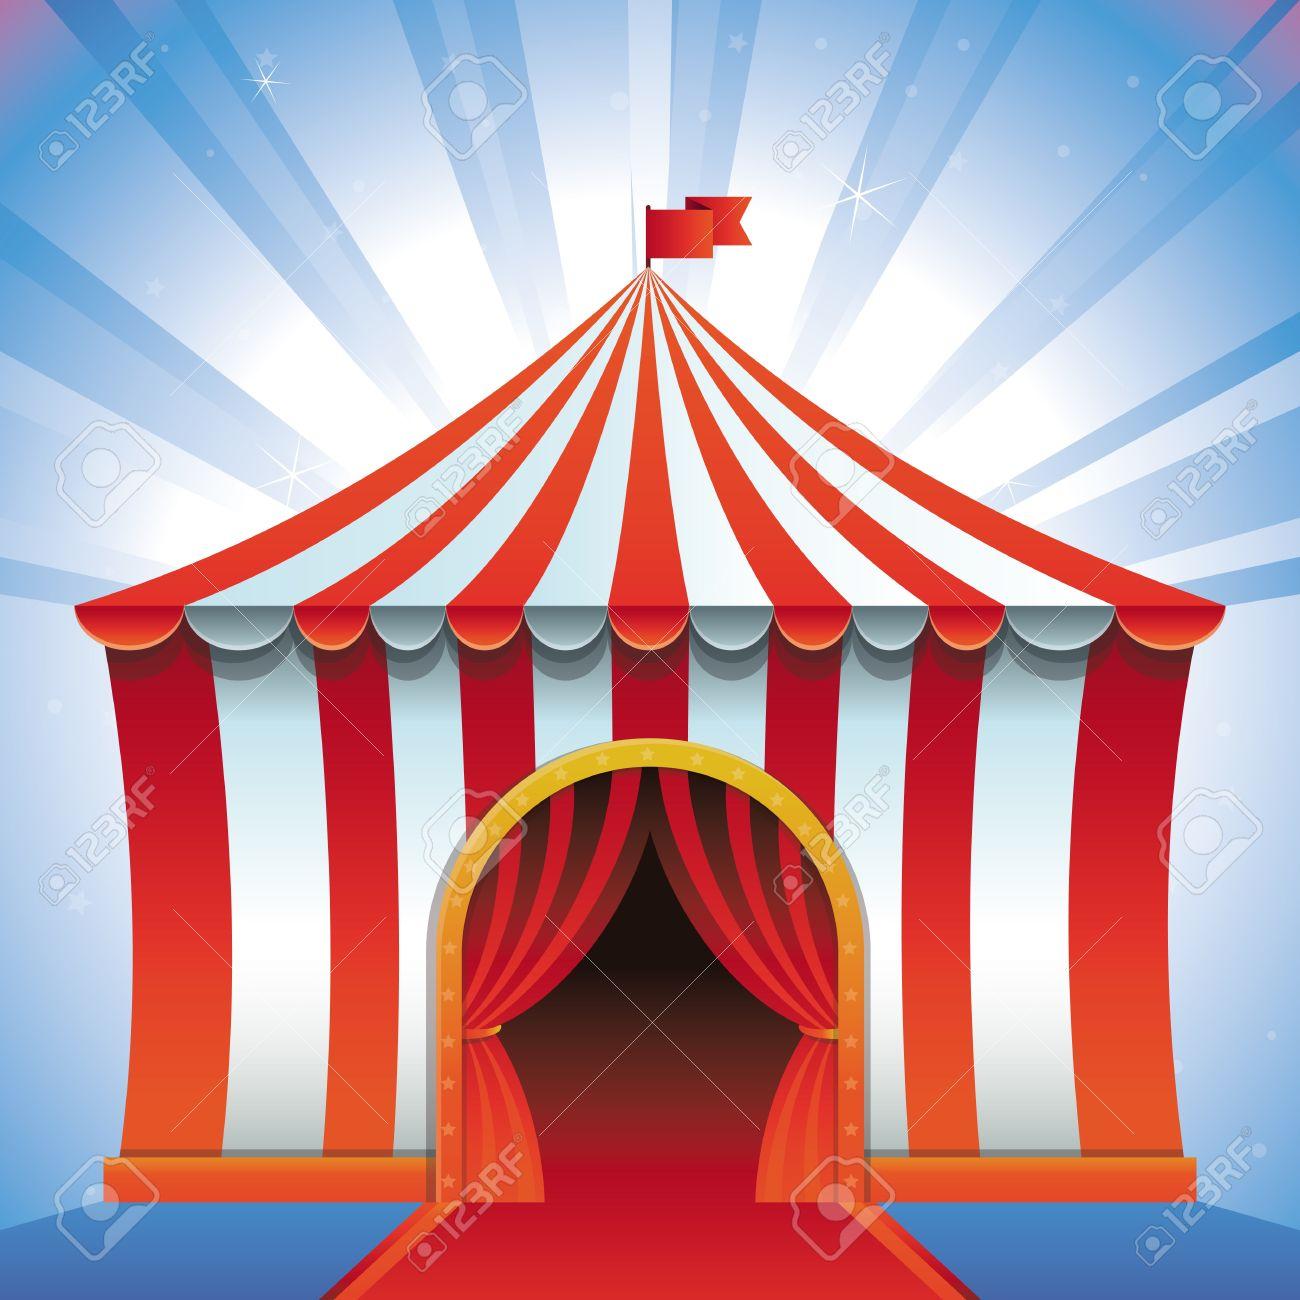 circus tent - bright icon - entertainment concept - 19375074